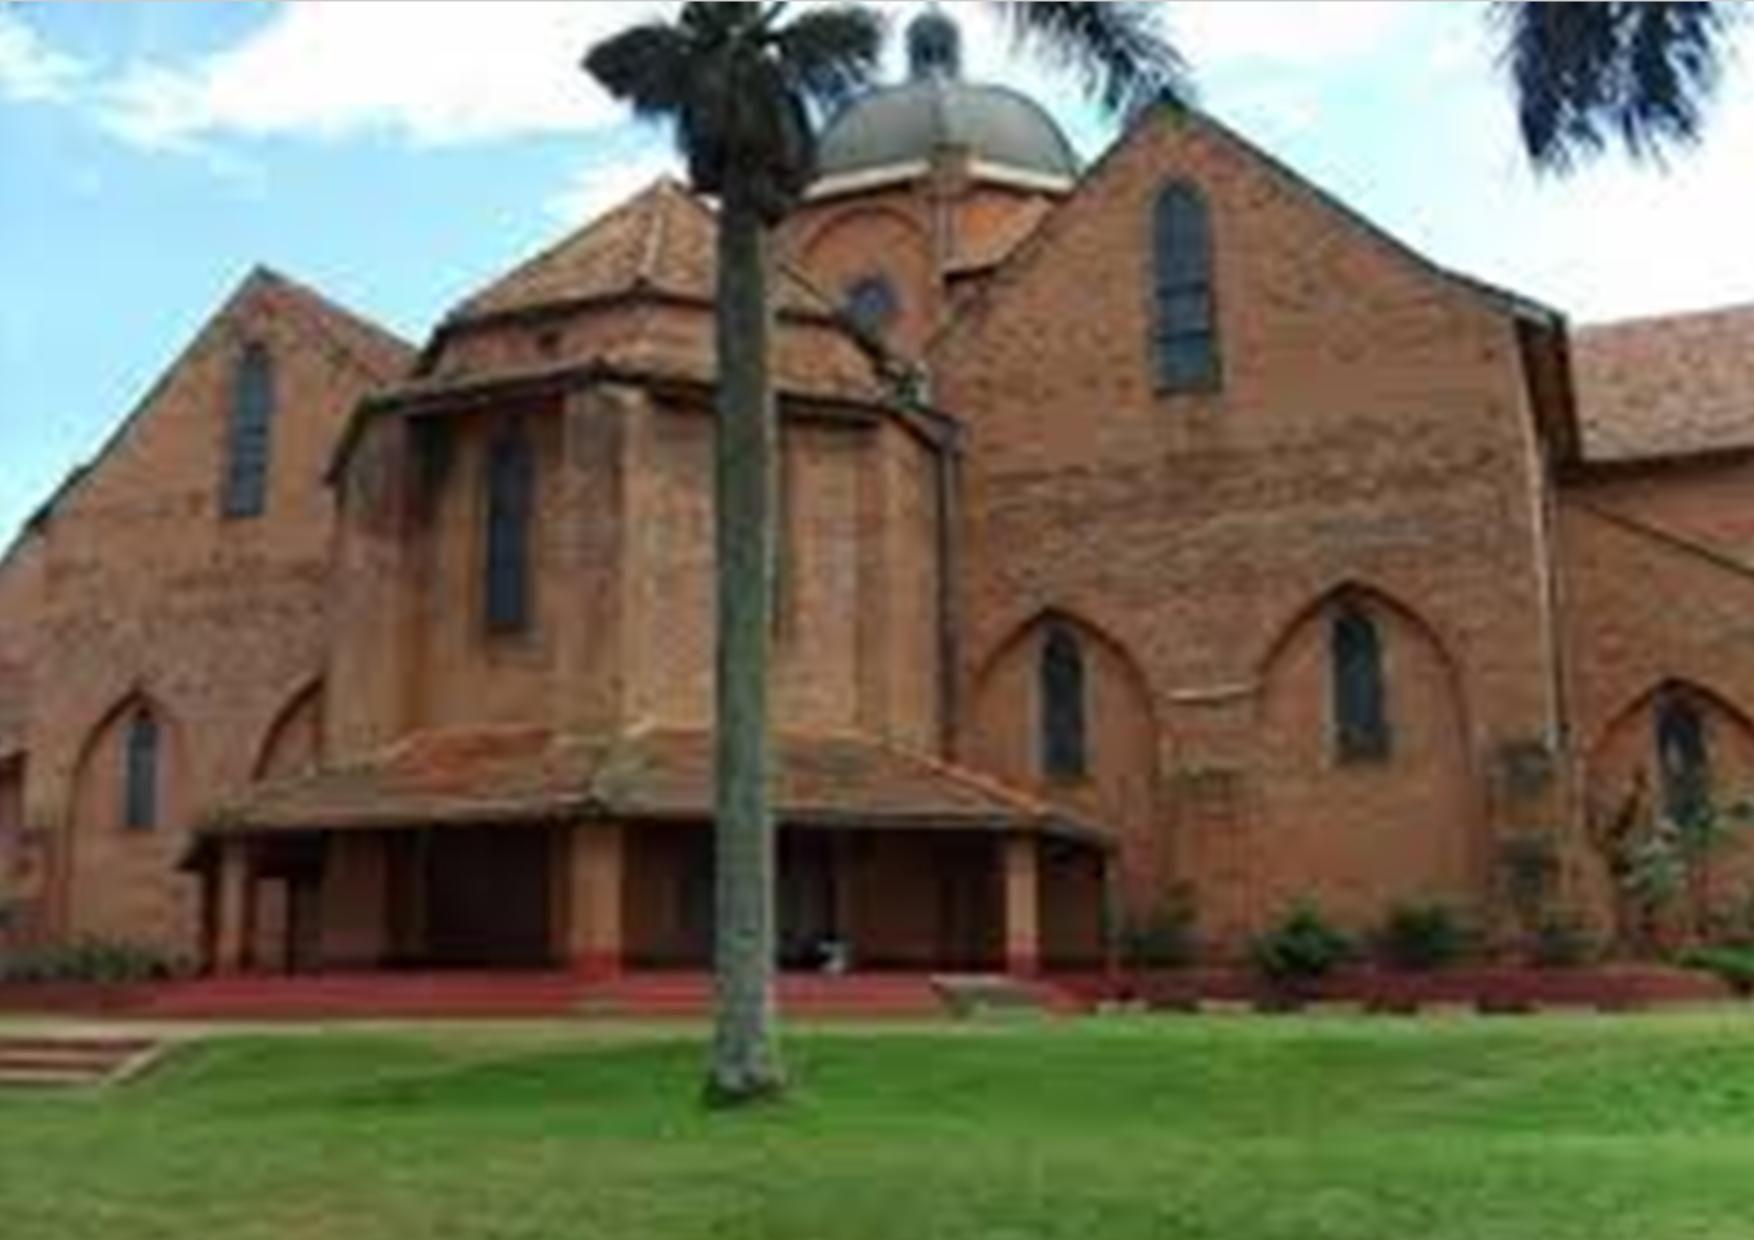 St. Paul's Namirembe cathedral Kampala, Uganda. ejn